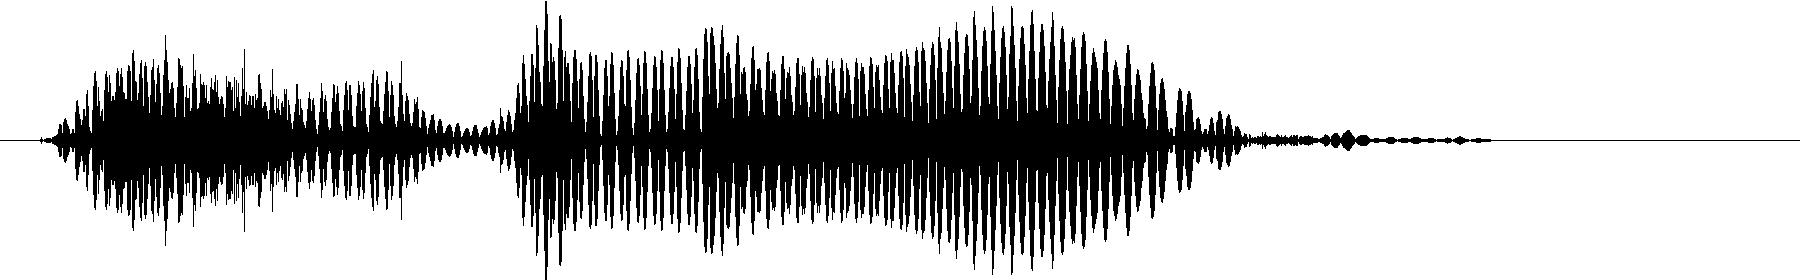 alvinspk47